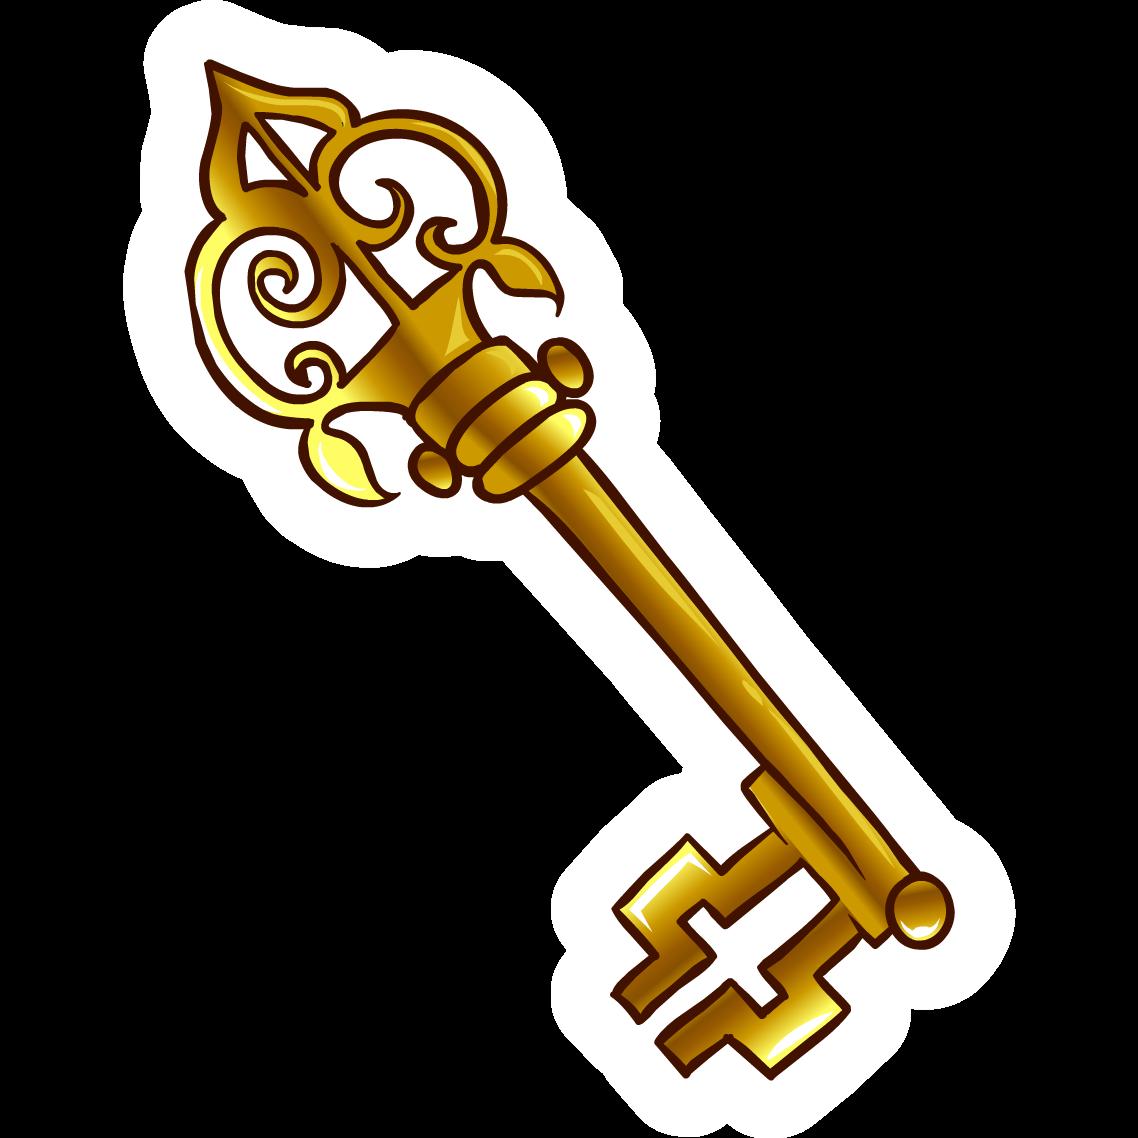 Key PNG Transparent Key.PNG Images. | PlusPNG